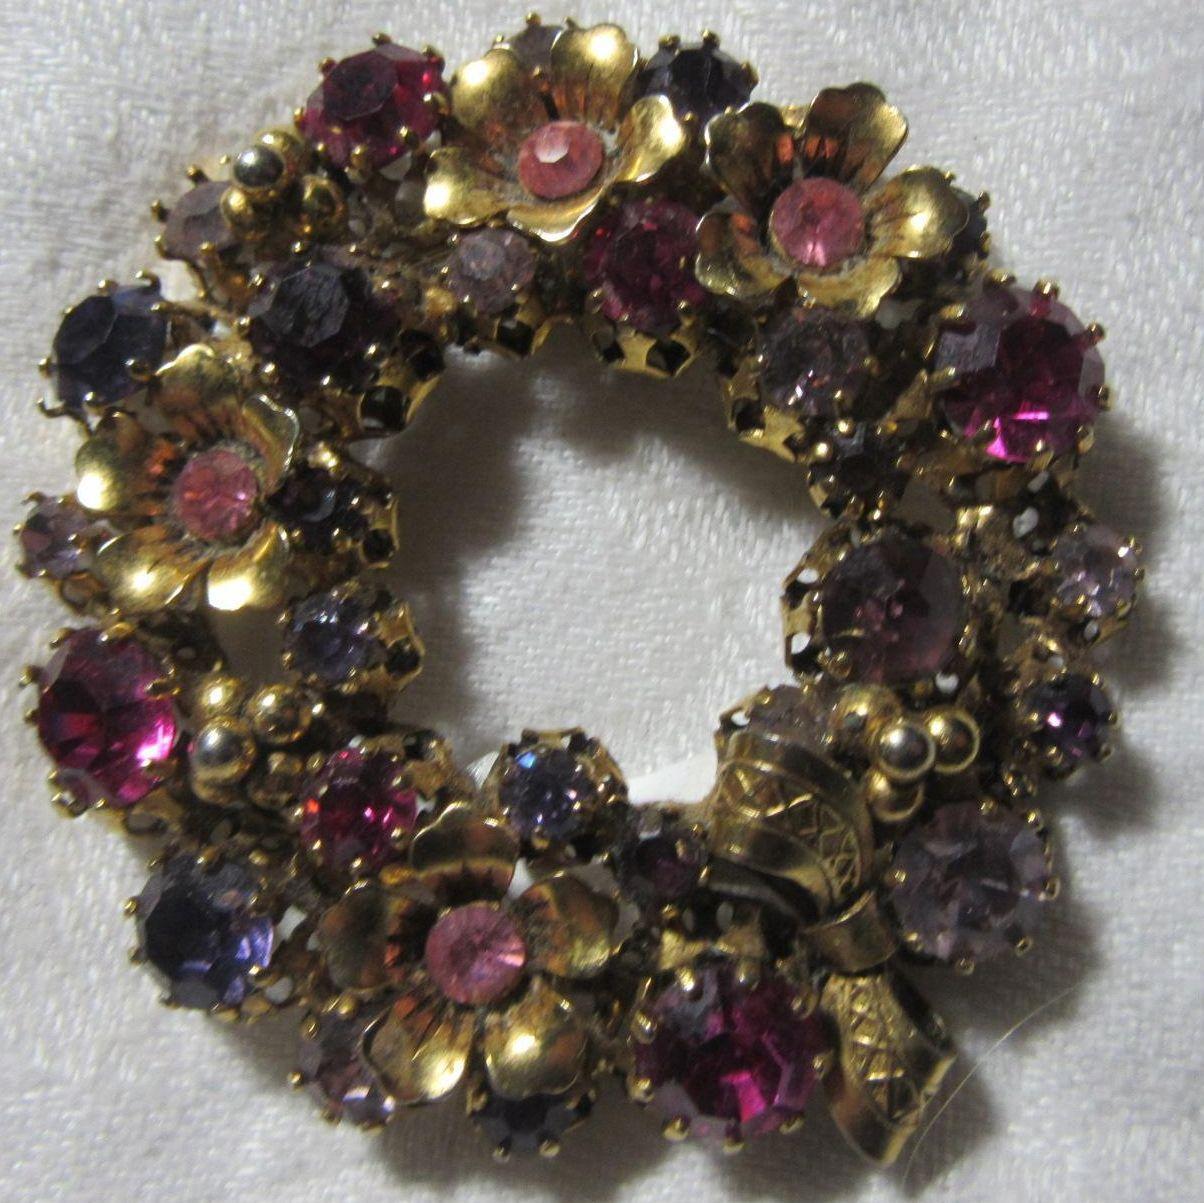 Austria Pink Violet Rhinestone Circle Pin Brooch Wreath Vintage Jewelry